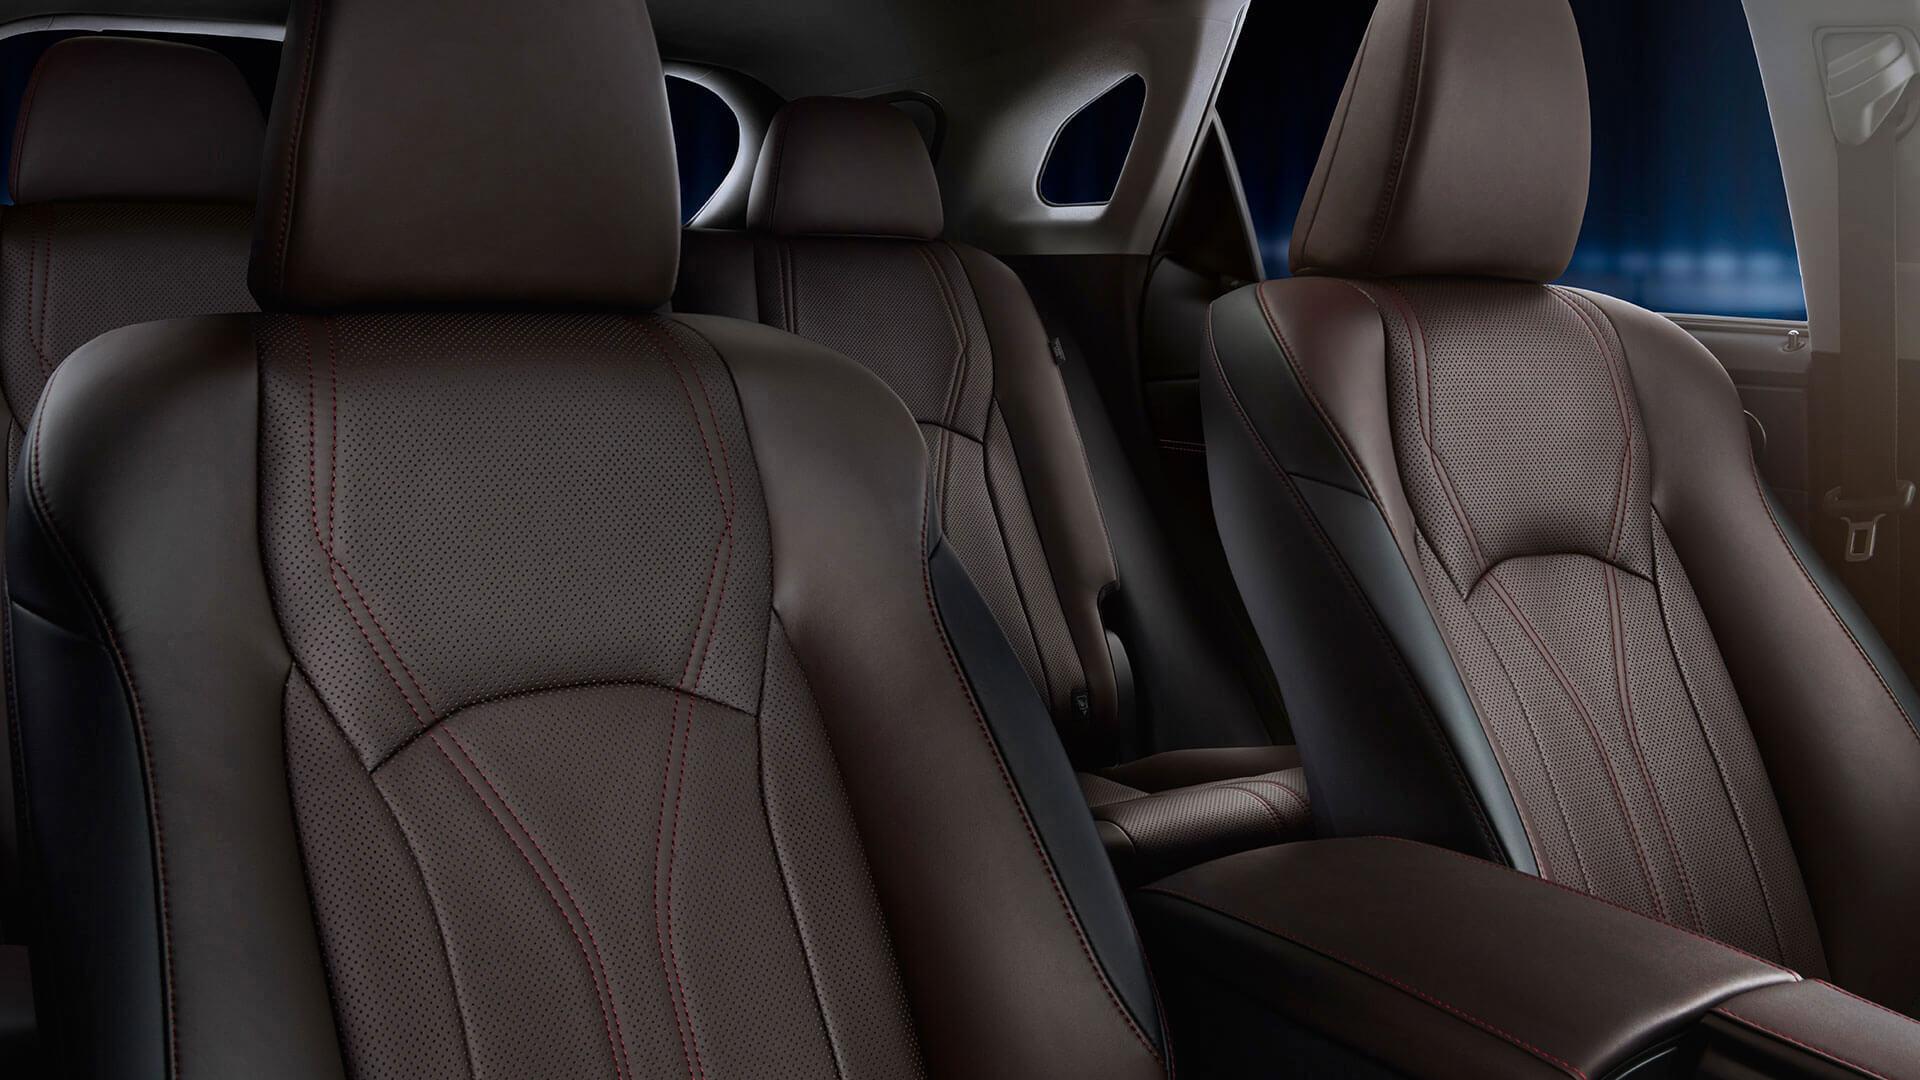 2017 lexus rx 450h features seat comfort